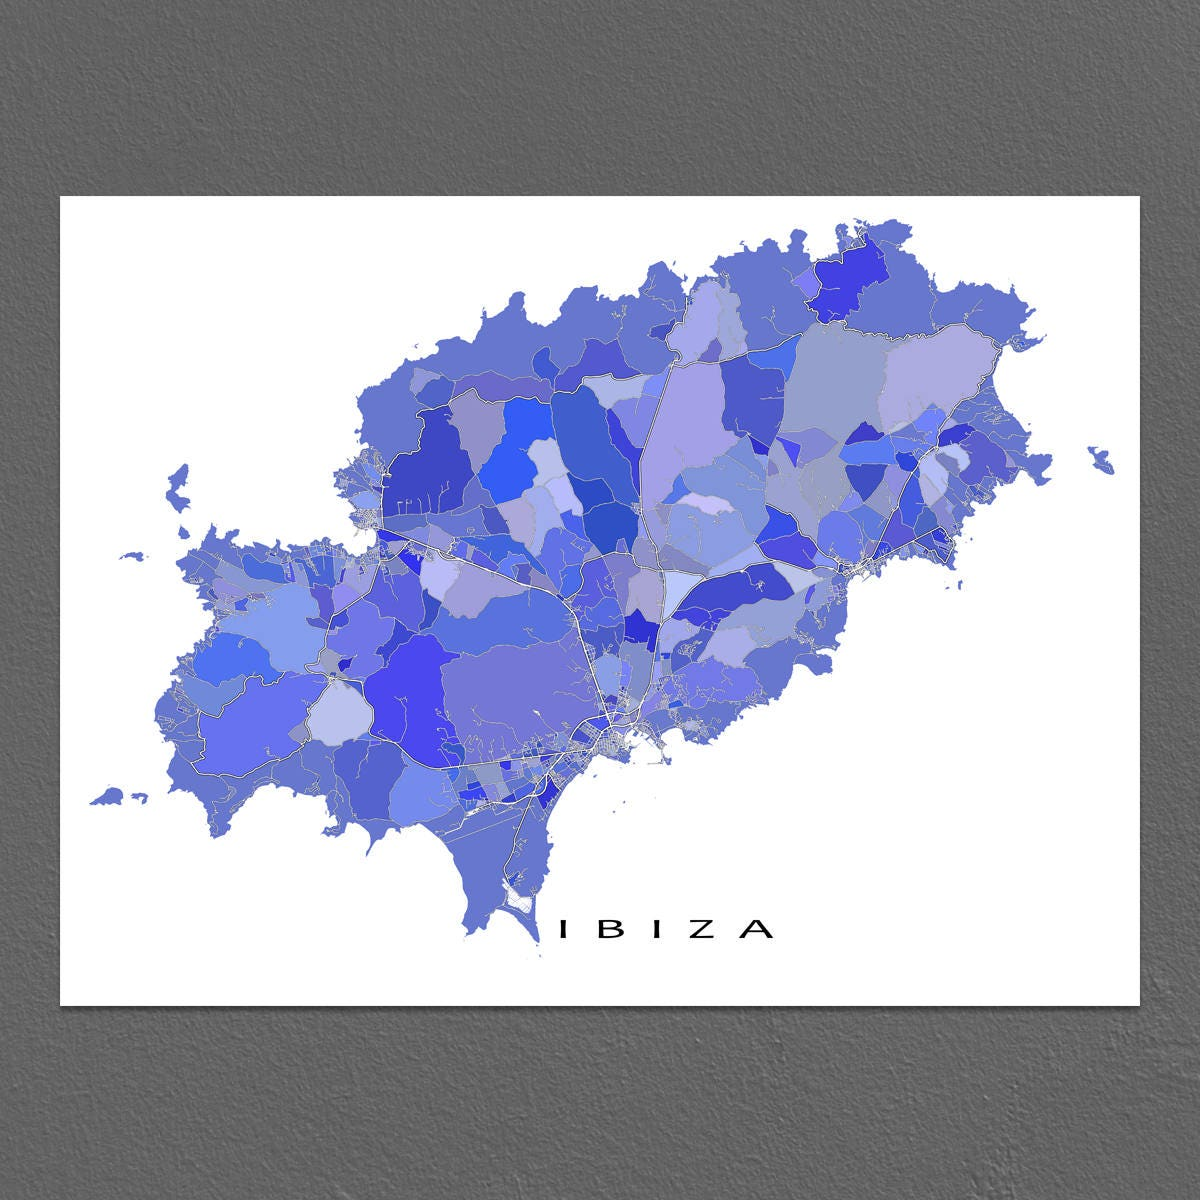 Ibiza Karte Ausdrucken.Ibiza Kunstdrucke Spanien Ibiza Karte Drucken Insel